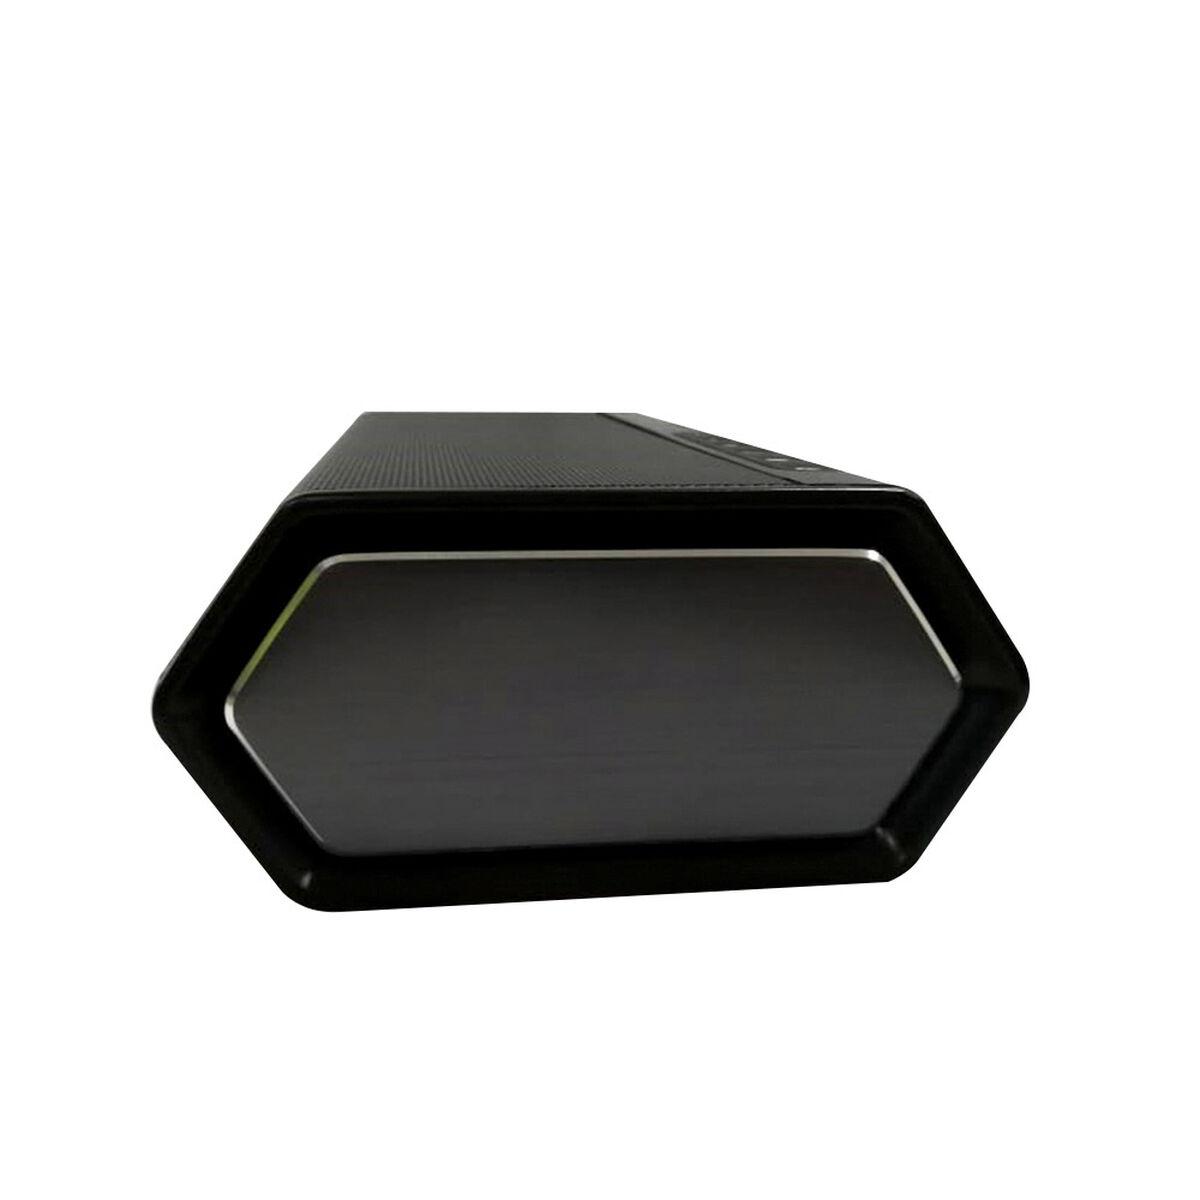 Parlante Bluetooth Lhotse Outdoor X40